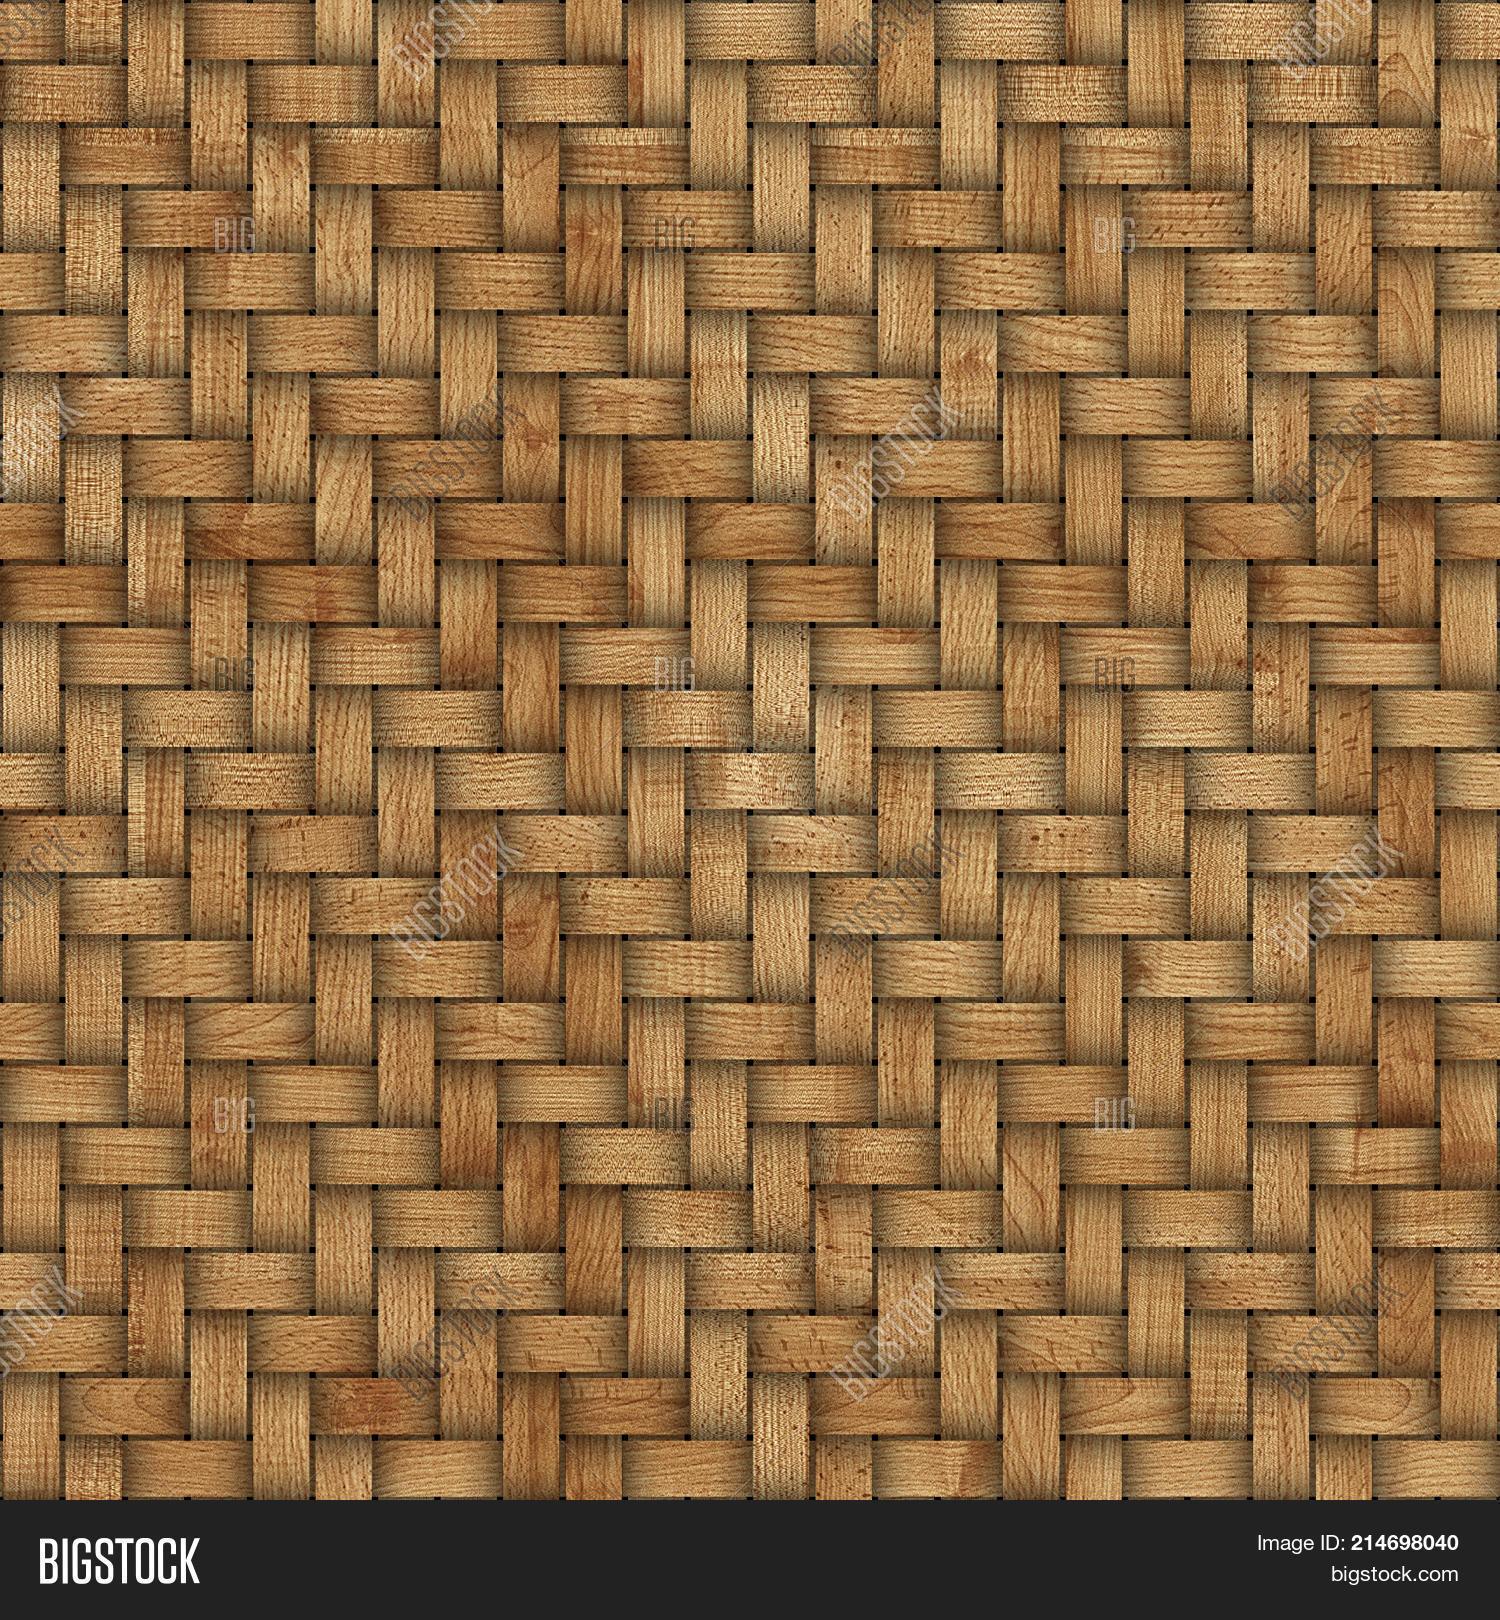 Wooden Weave Texture Background. Image & Photo | Bigstock